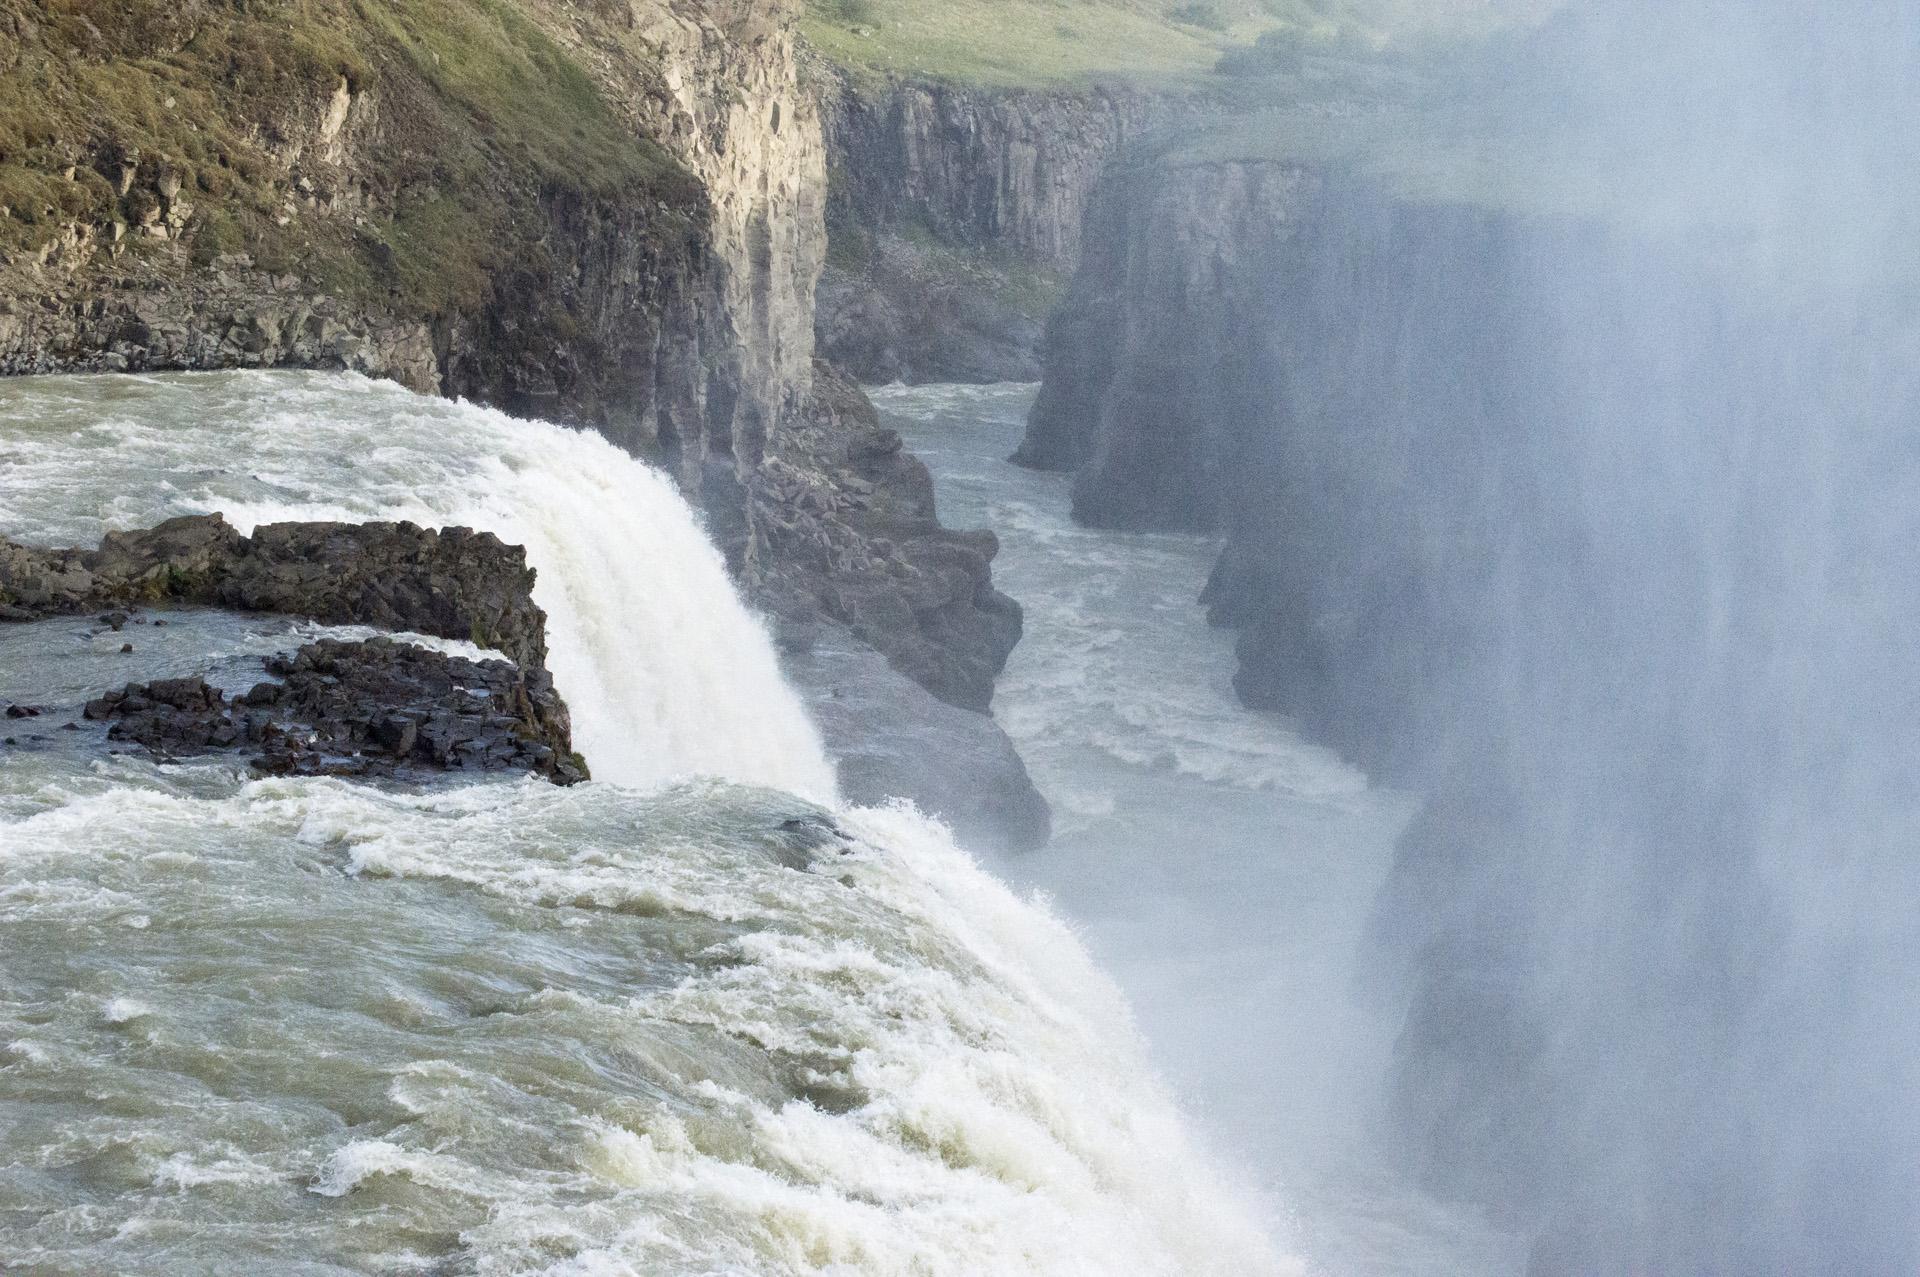 Hvitá river extends from Gullfoss waterfall, Suðurland region, Iceland